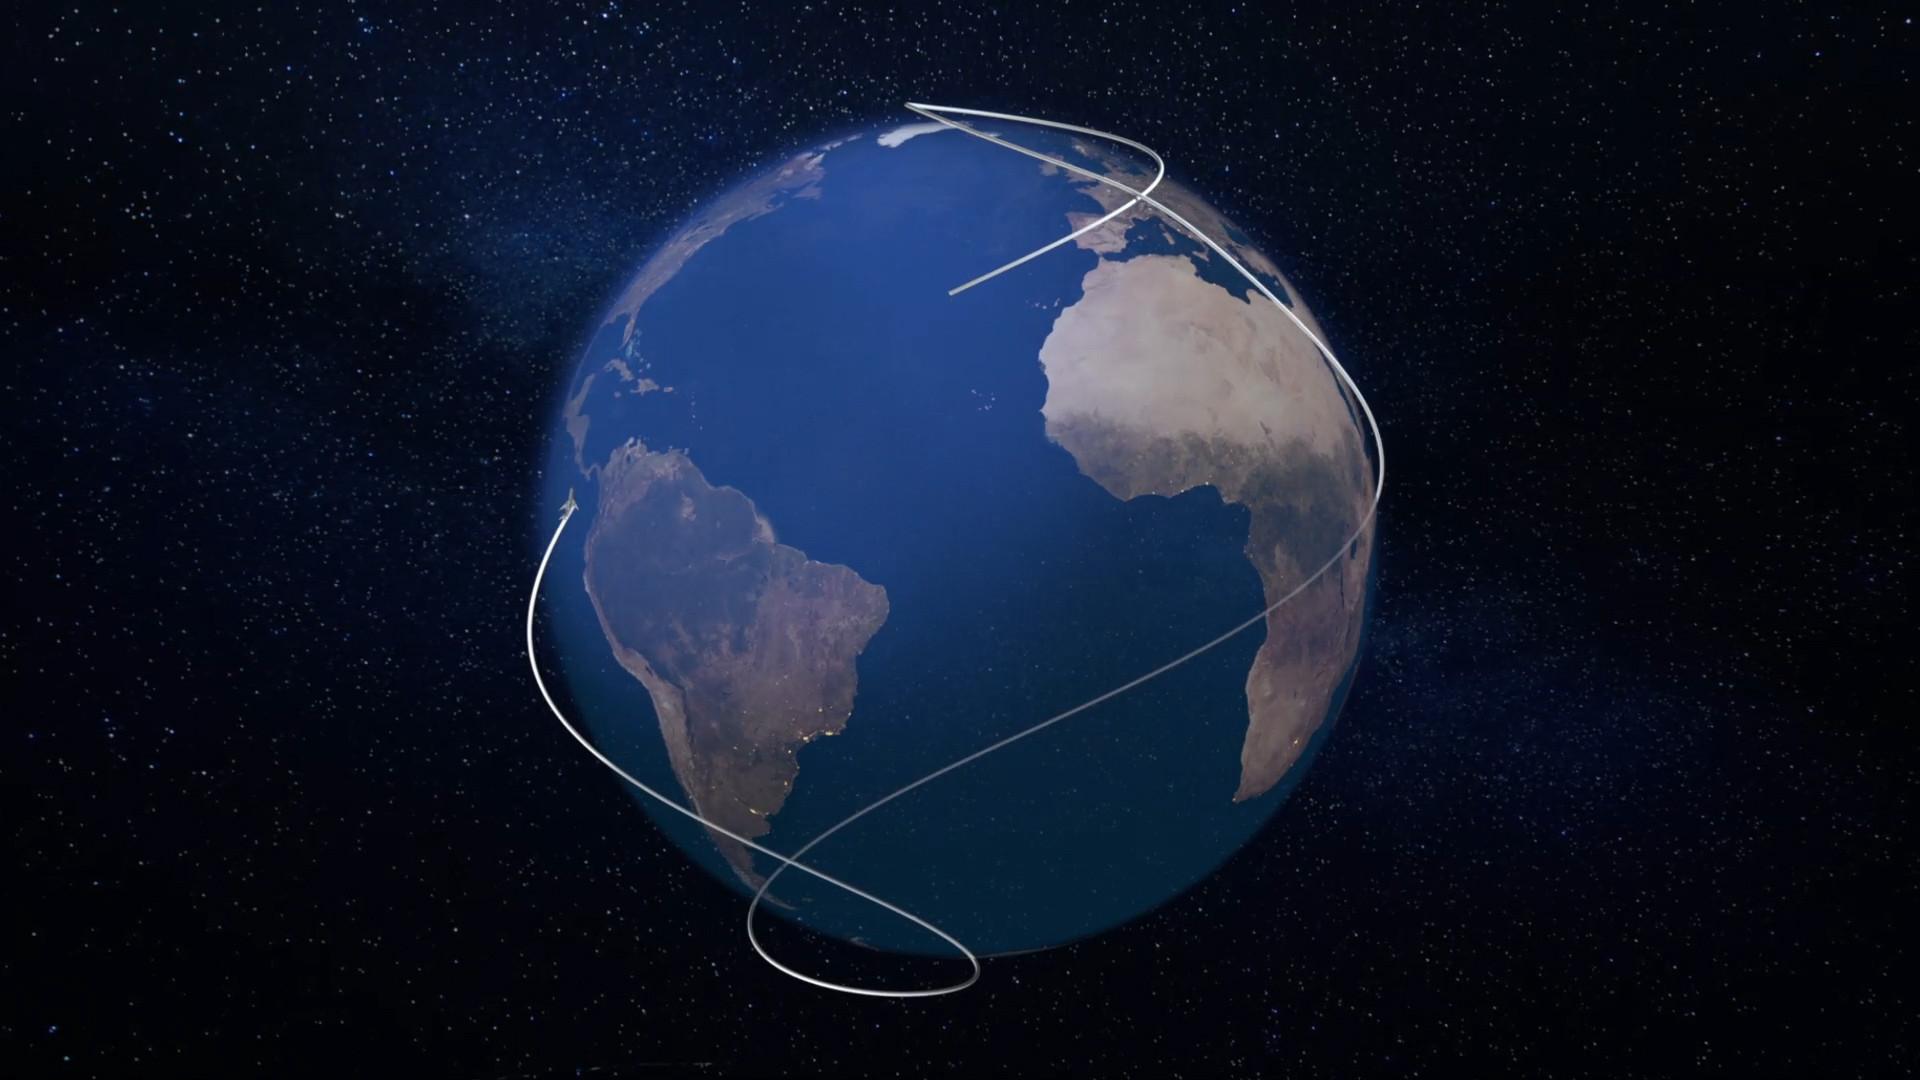 06. One More Orbit Flight Path